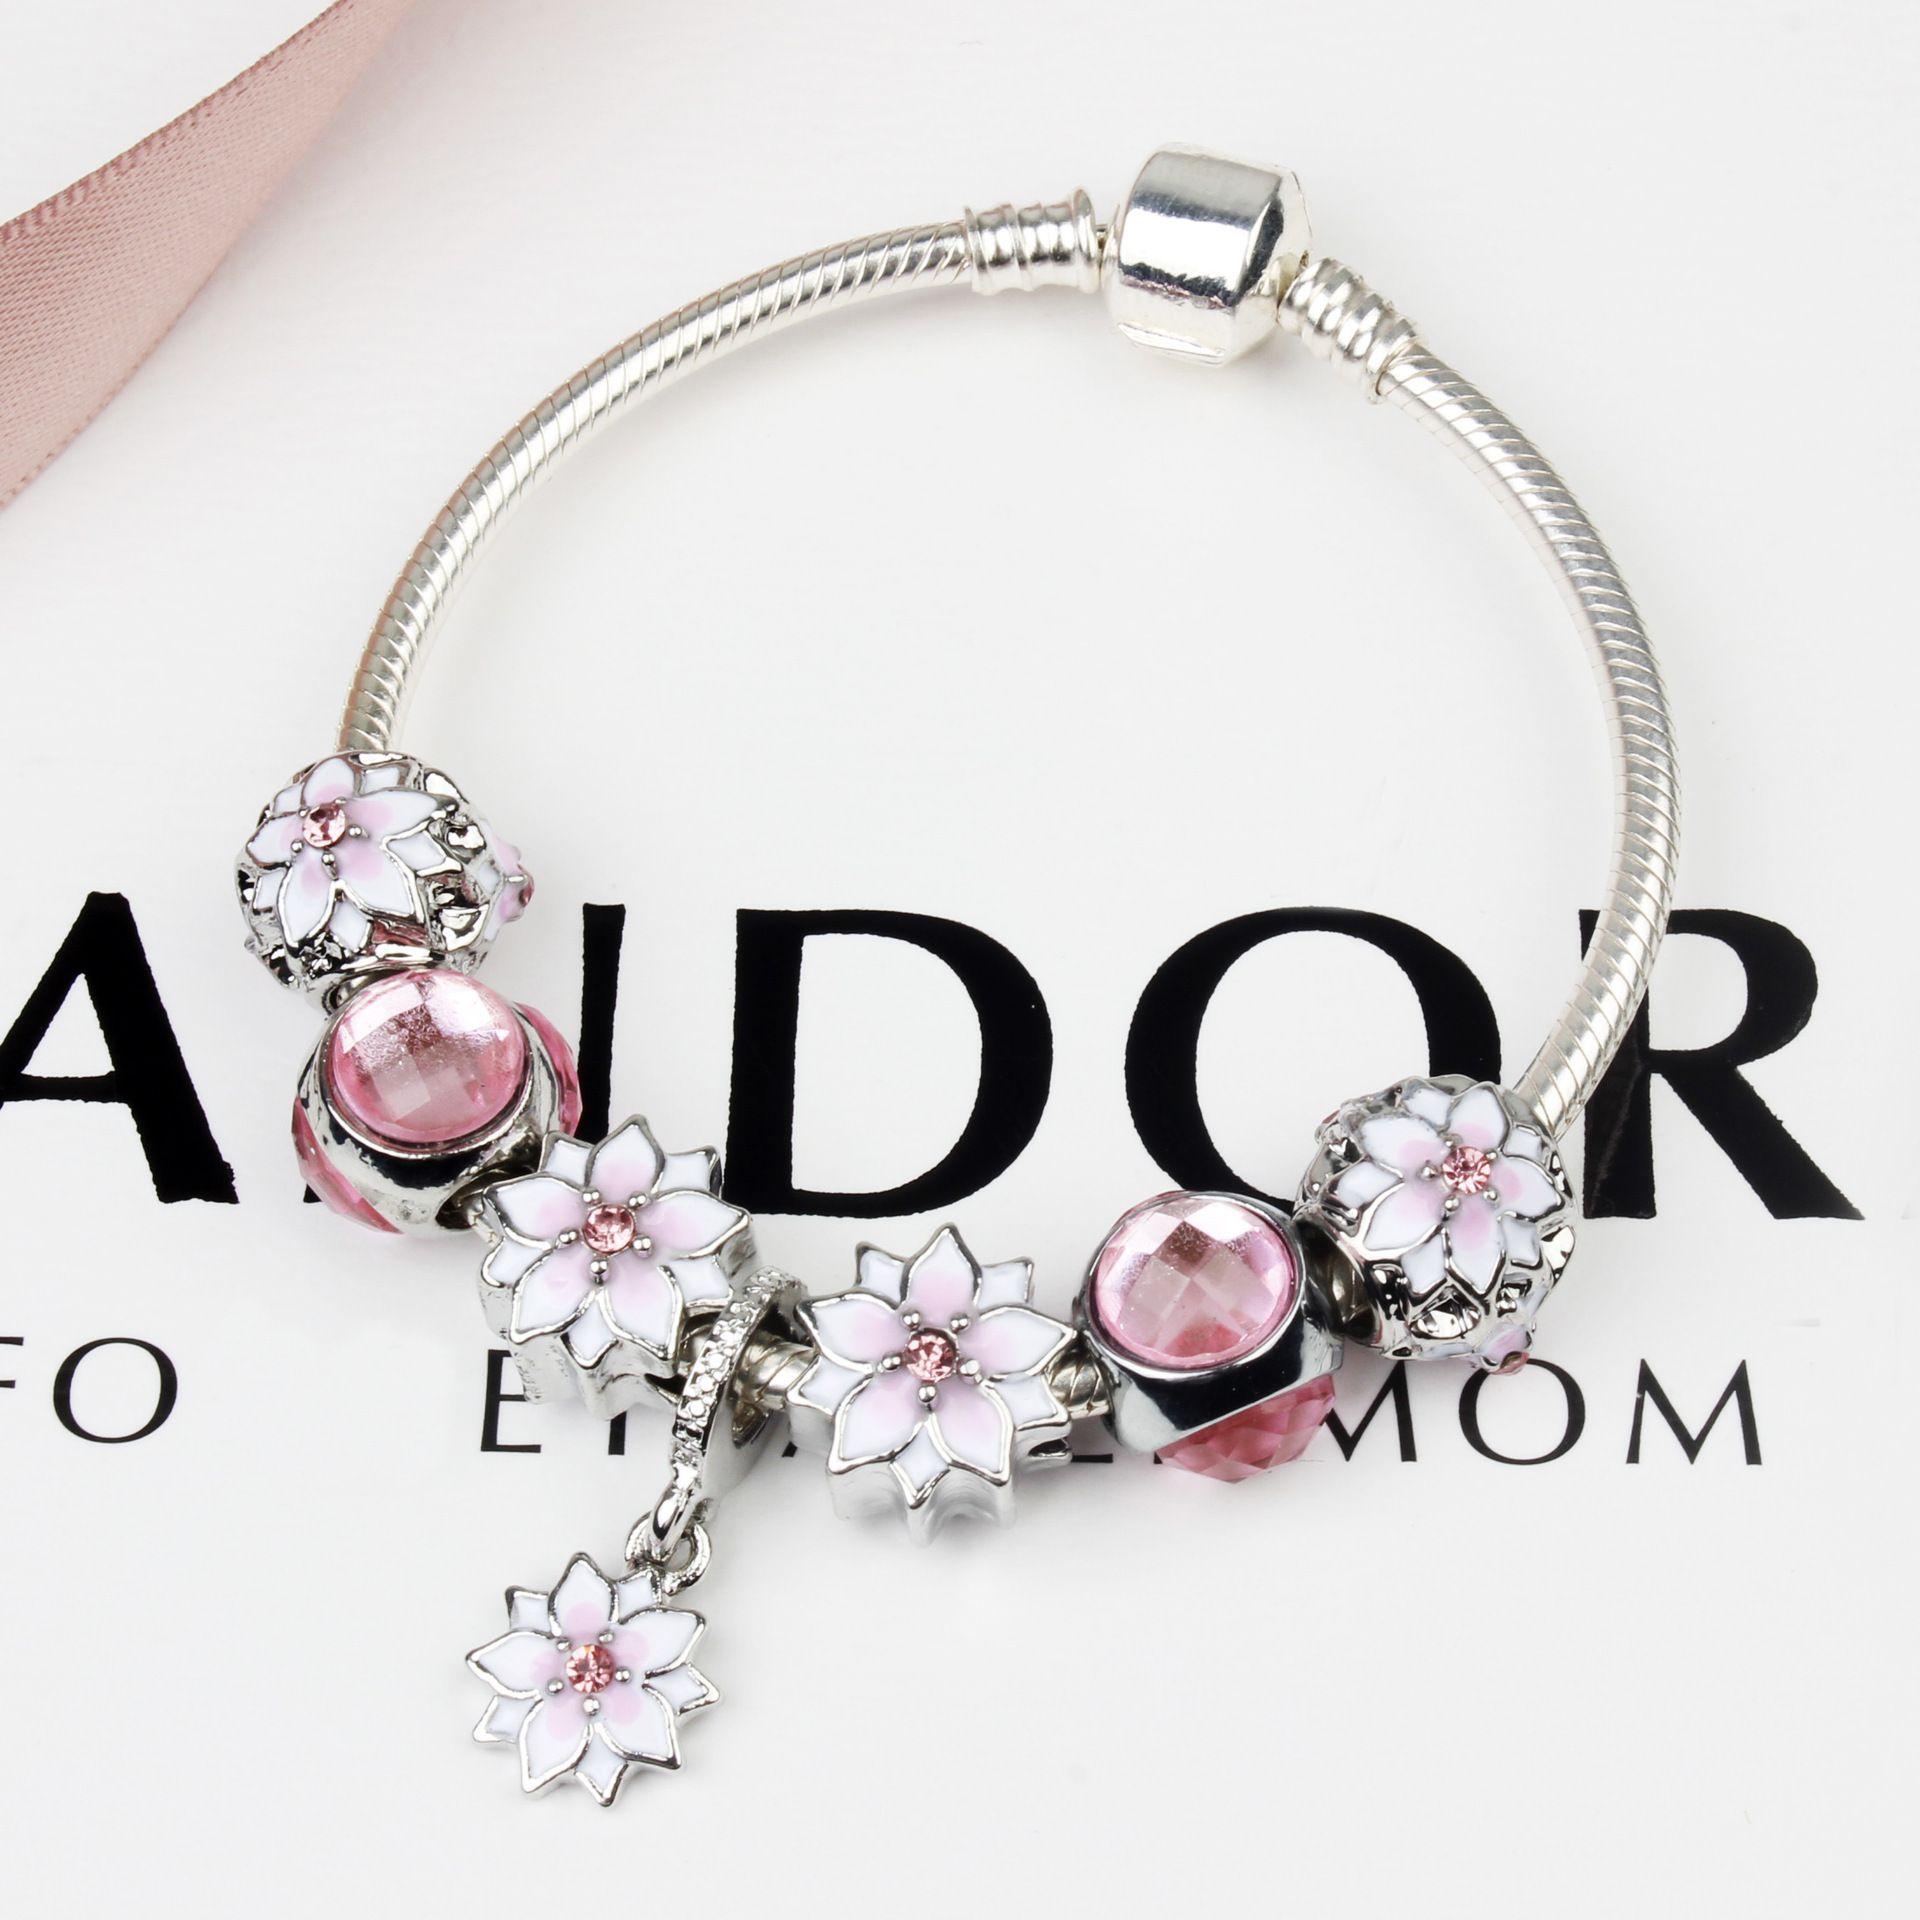 18 19 20cm Magnolia Flower Bracelet Fashion Bracelets For Women Pink